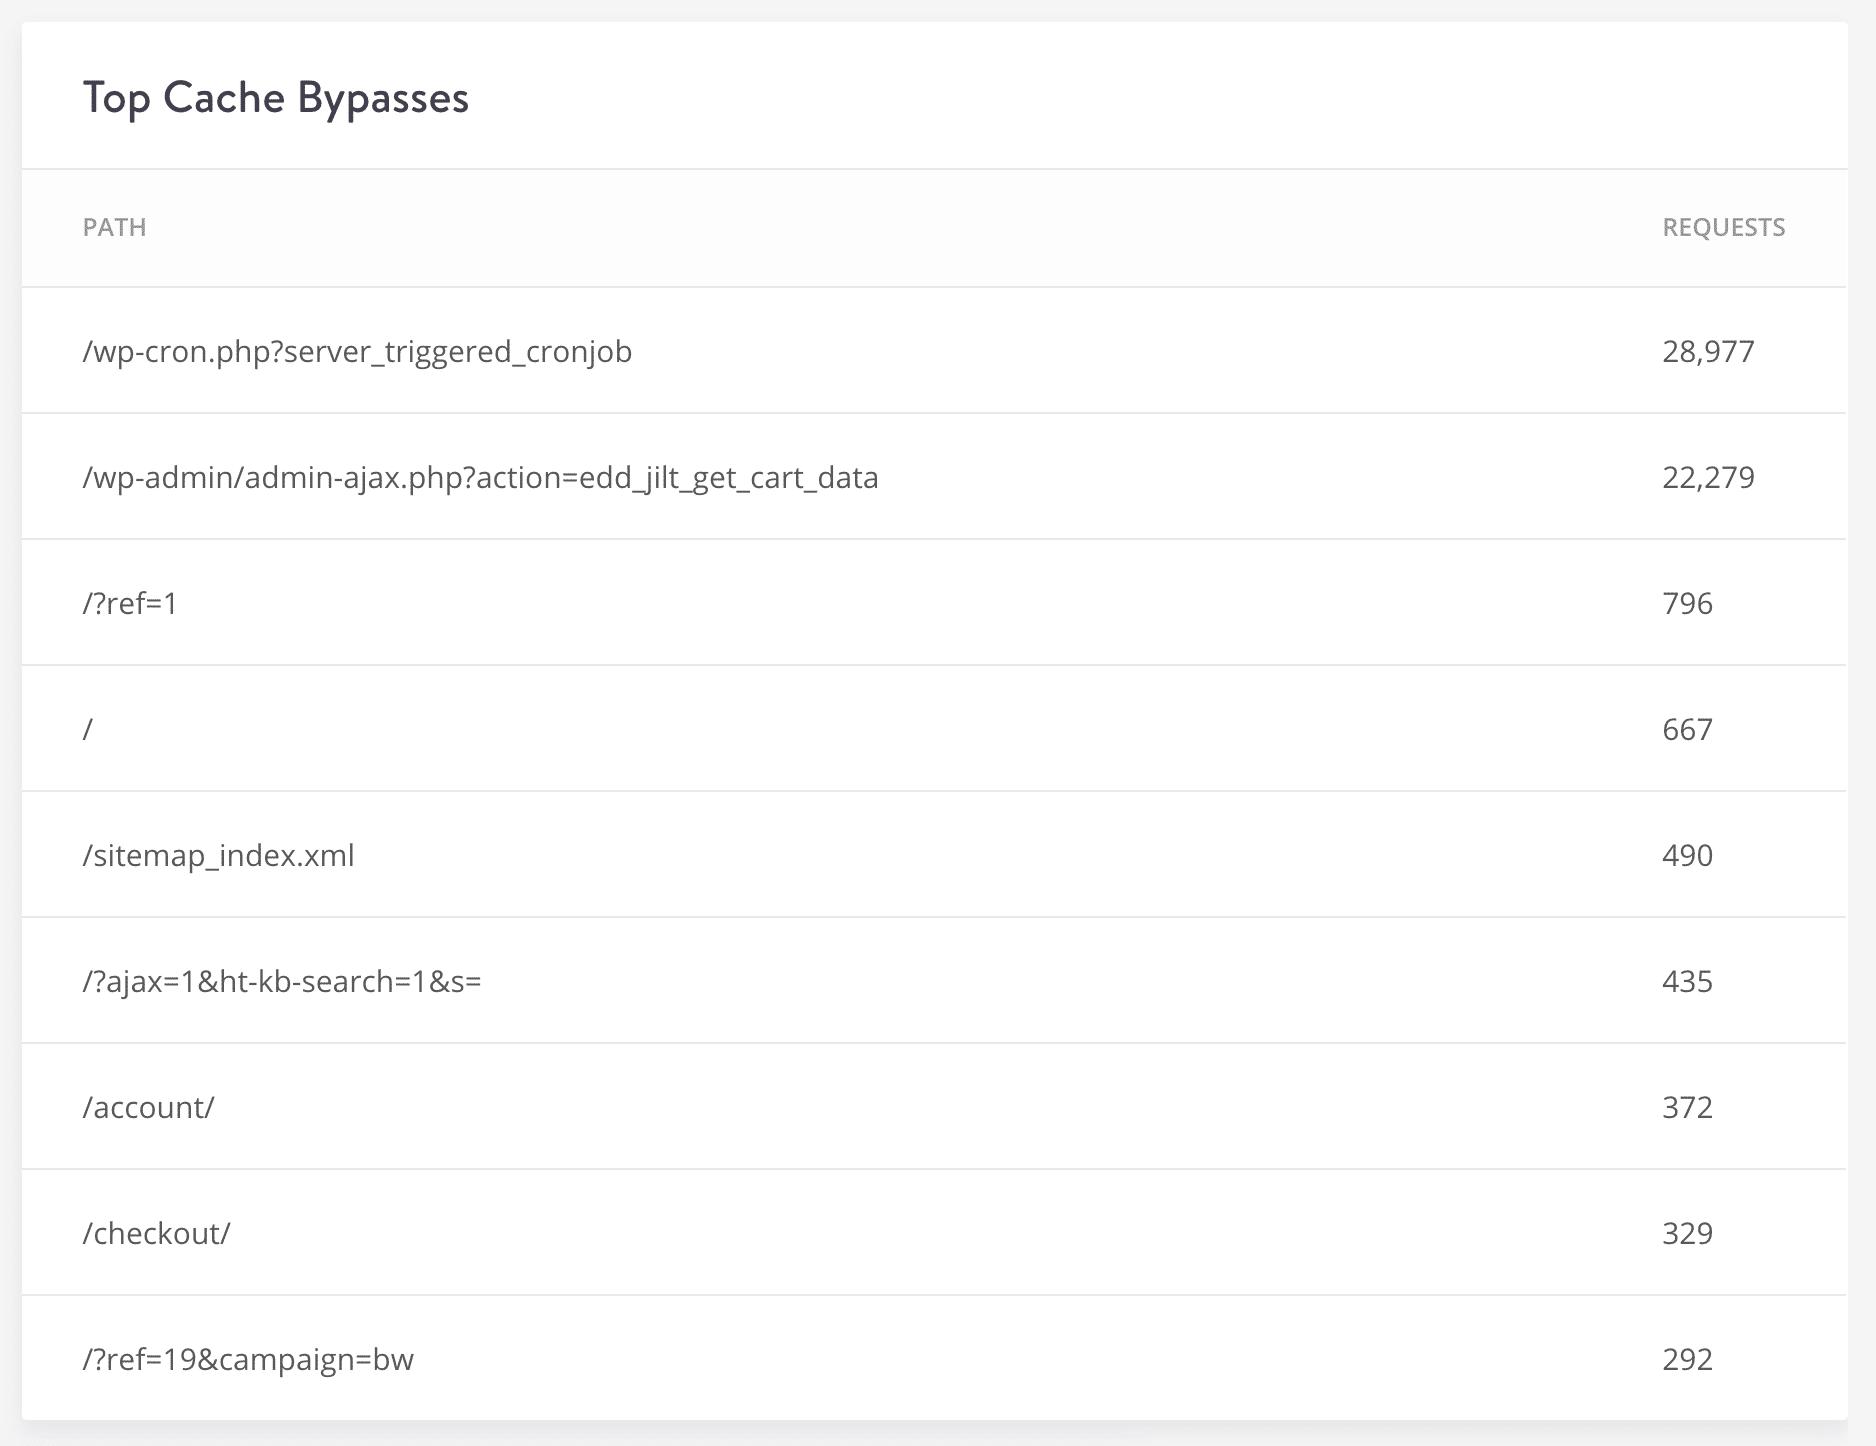 Desvios do cache superior do WordPress